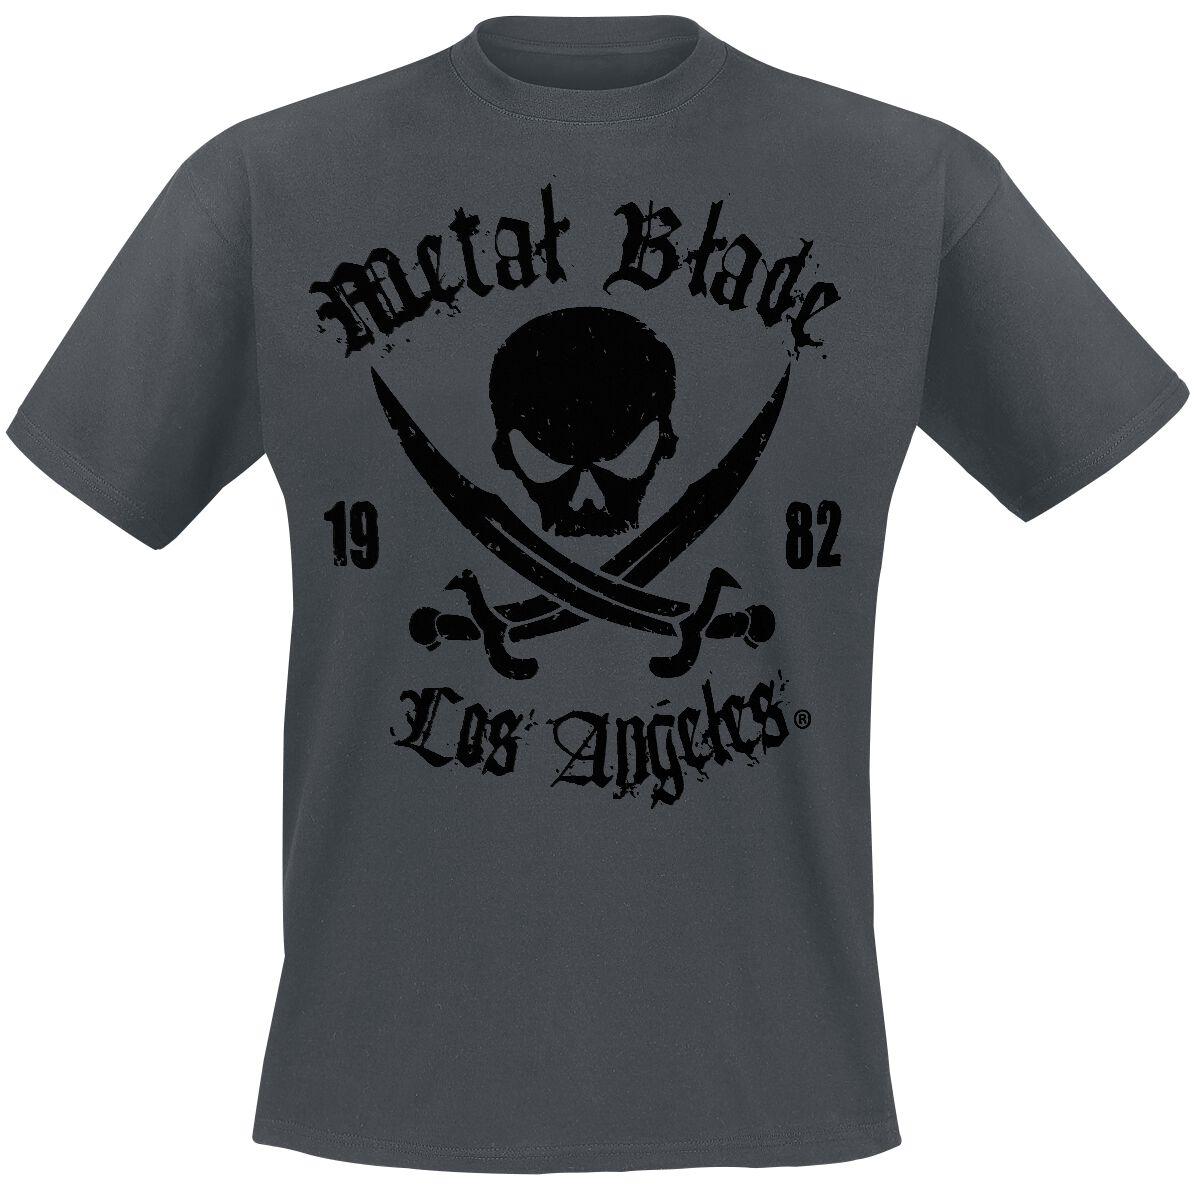 Merch dla Fanów - Koszulki - T-Shirt Metal Blade Pirate Logo T-Shirt szary - 289822